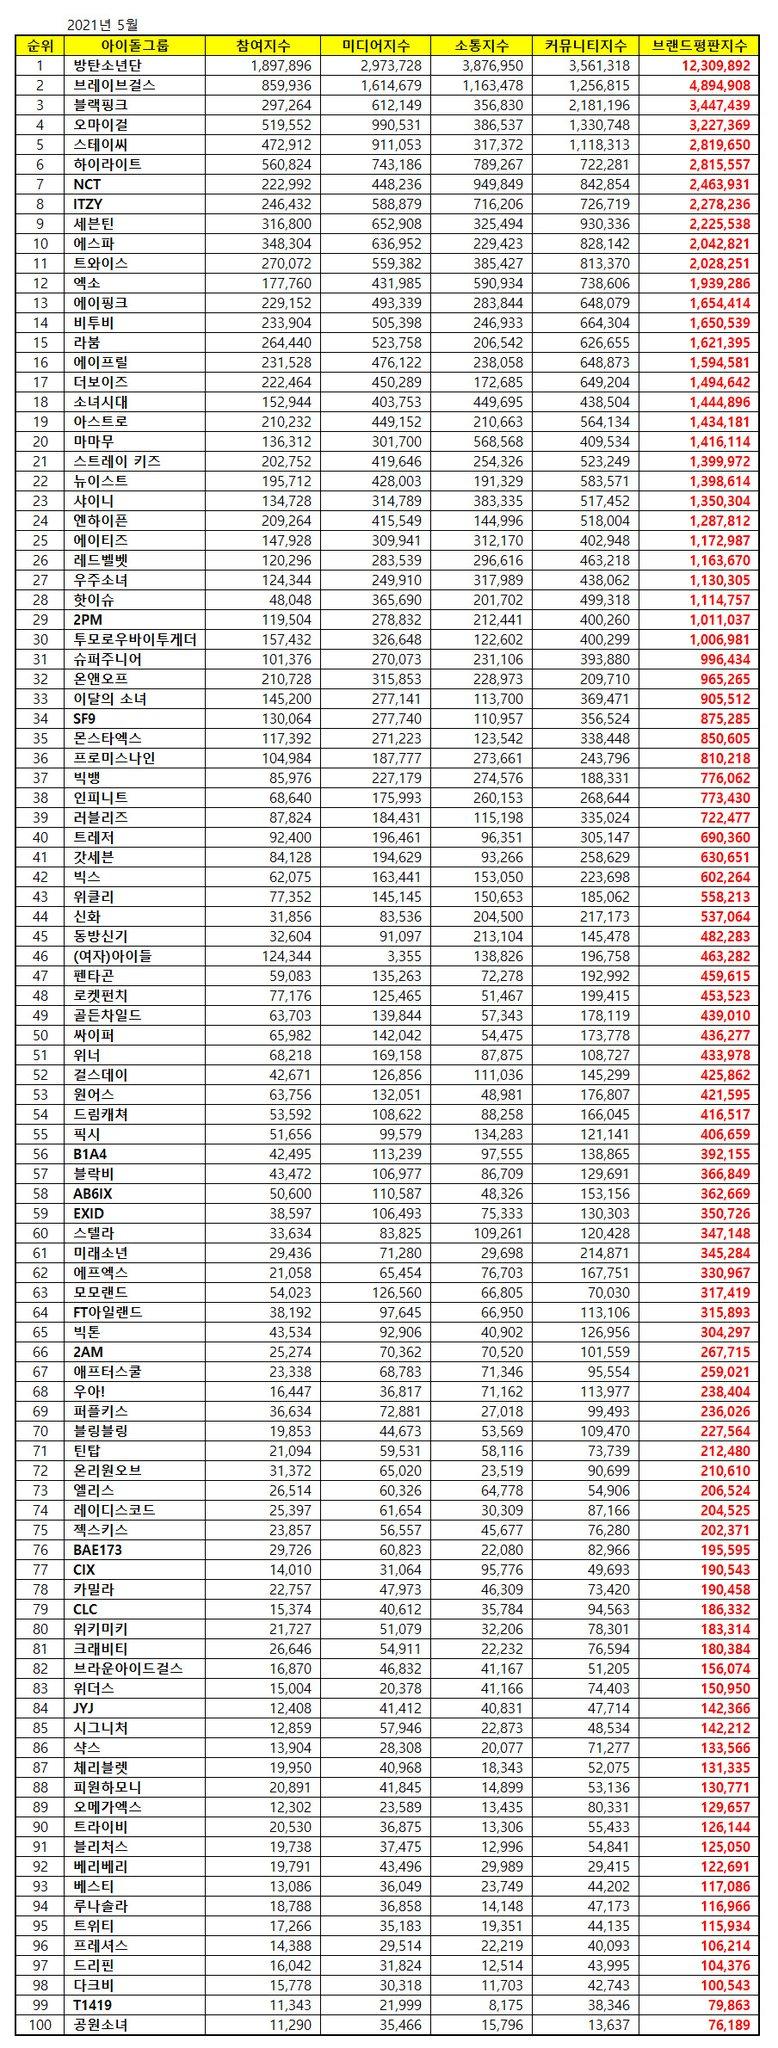 """Imitation"" SHAX Enters May Idol Group Brand Reputation Ranking"